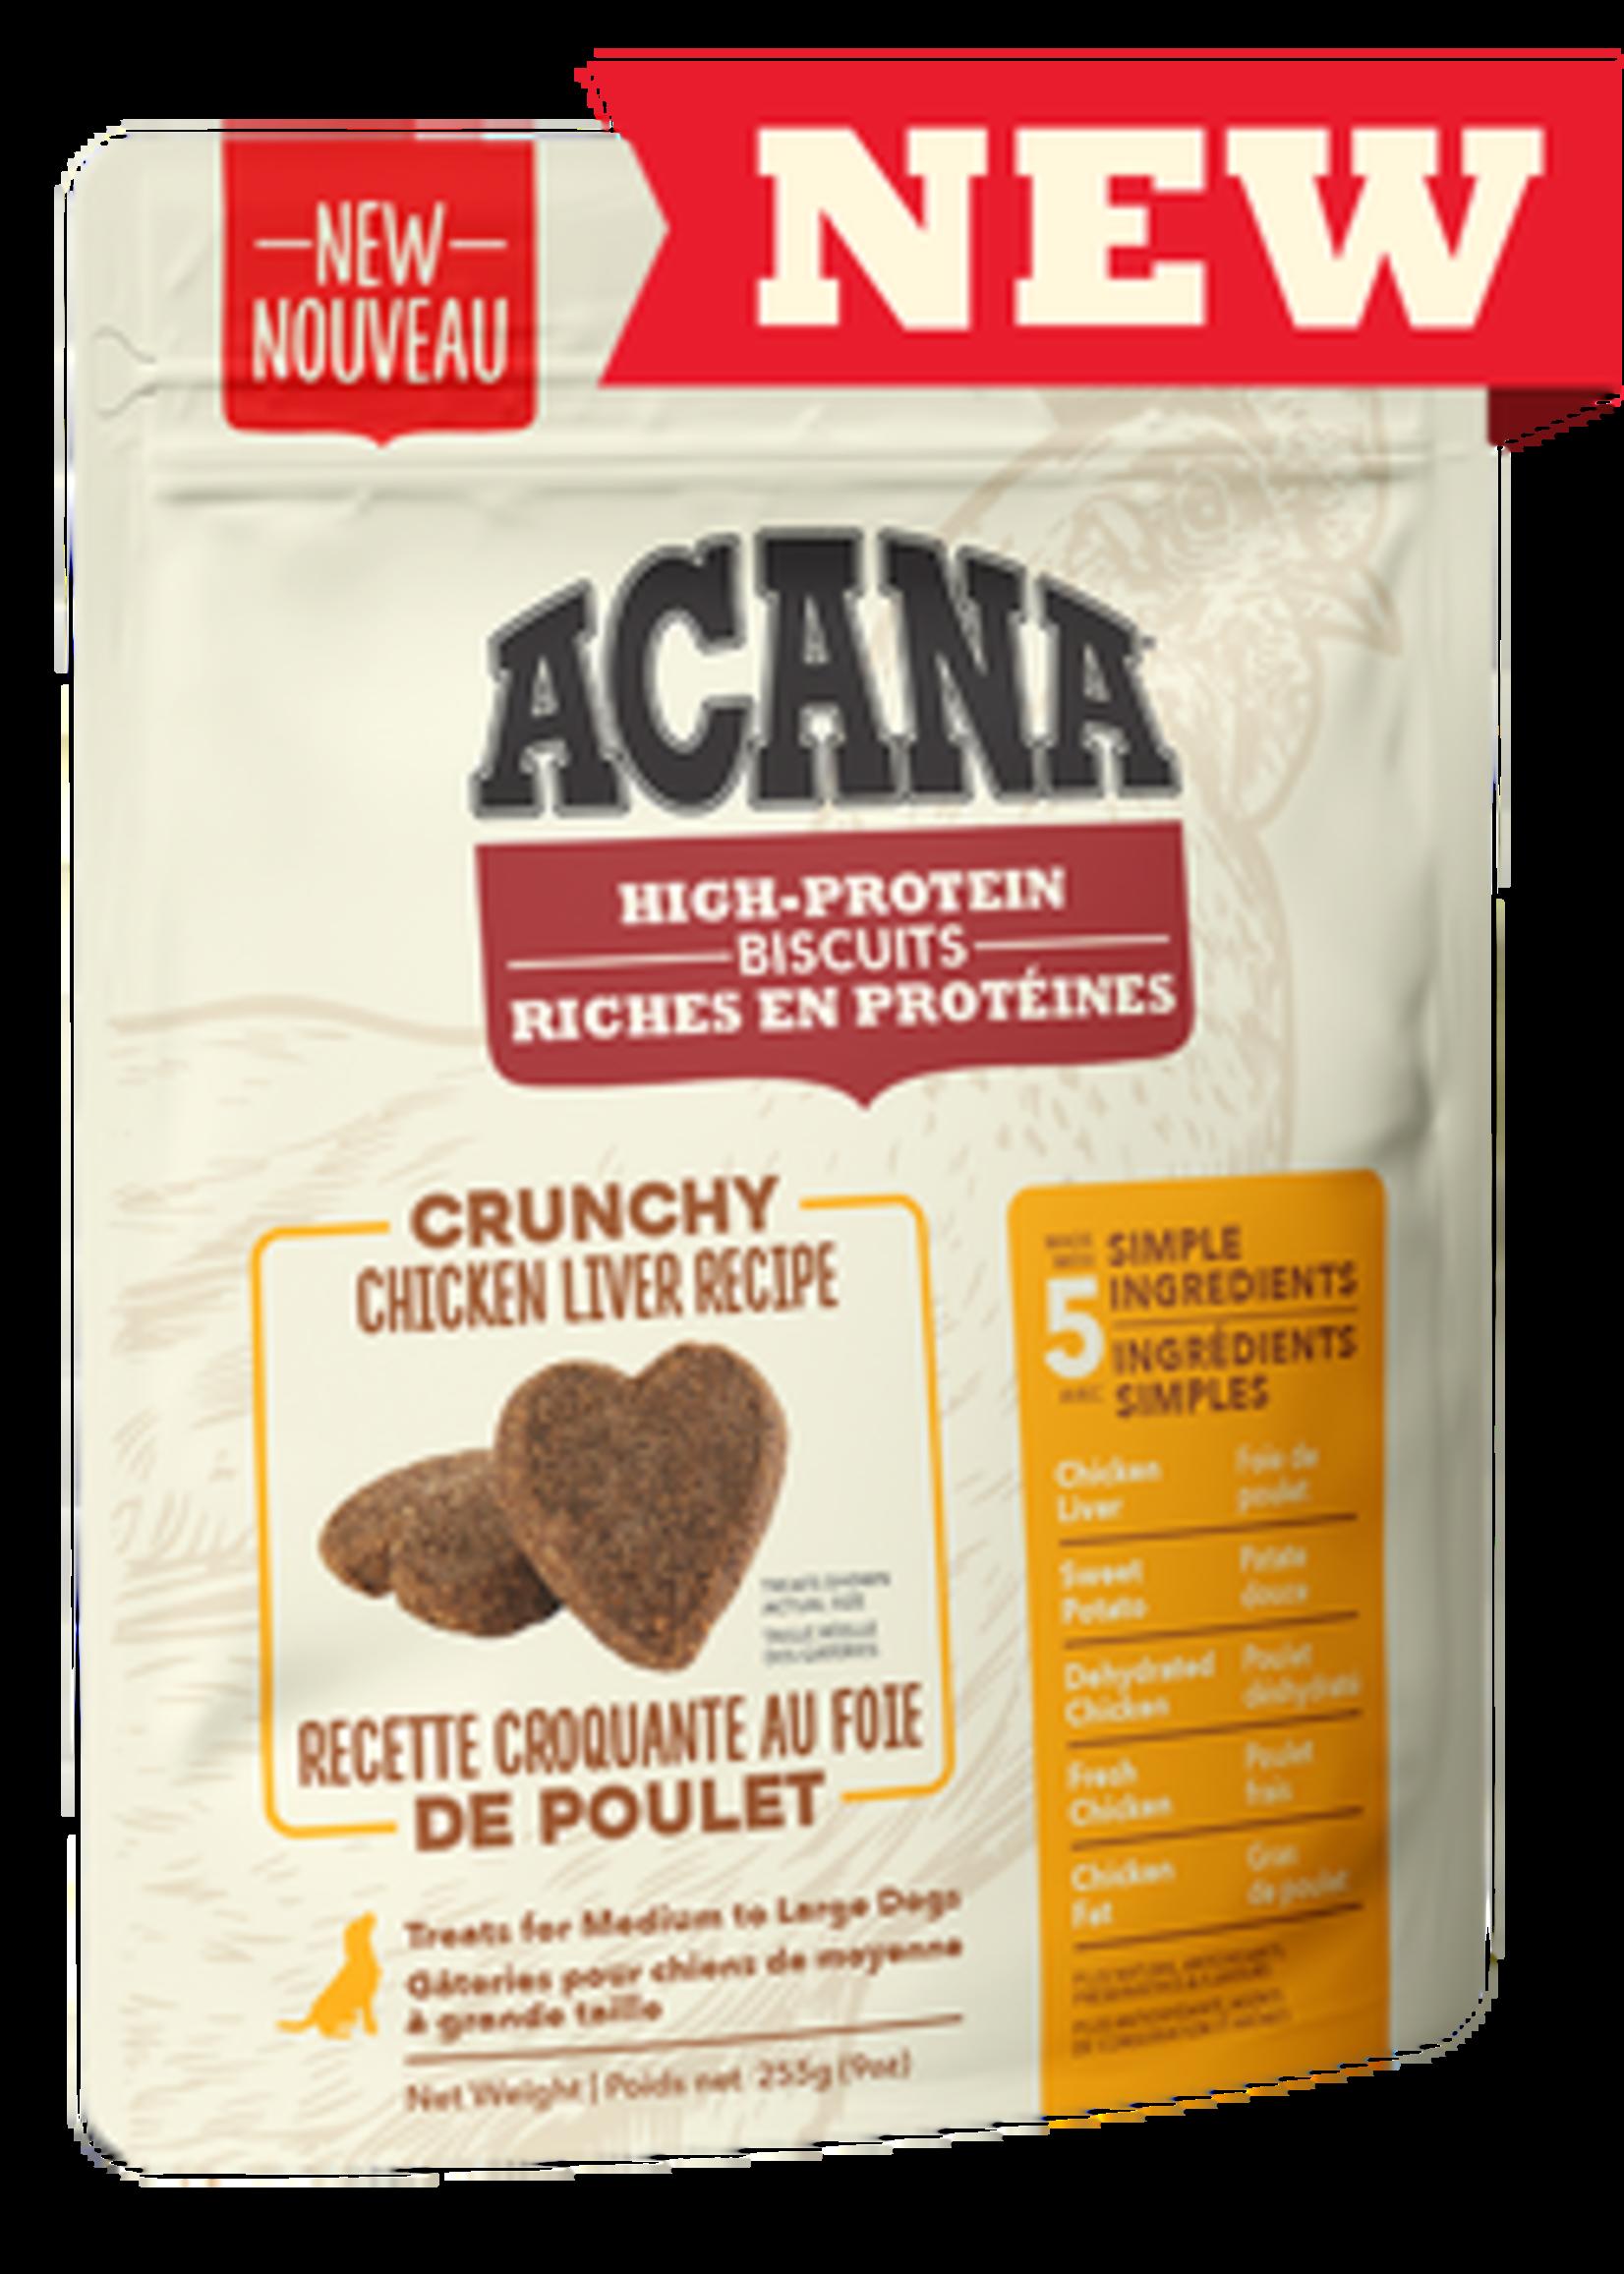 Acana® Acana High-Protein Biscuits, Crunchy Chicken Liver Recipe 9oz Small